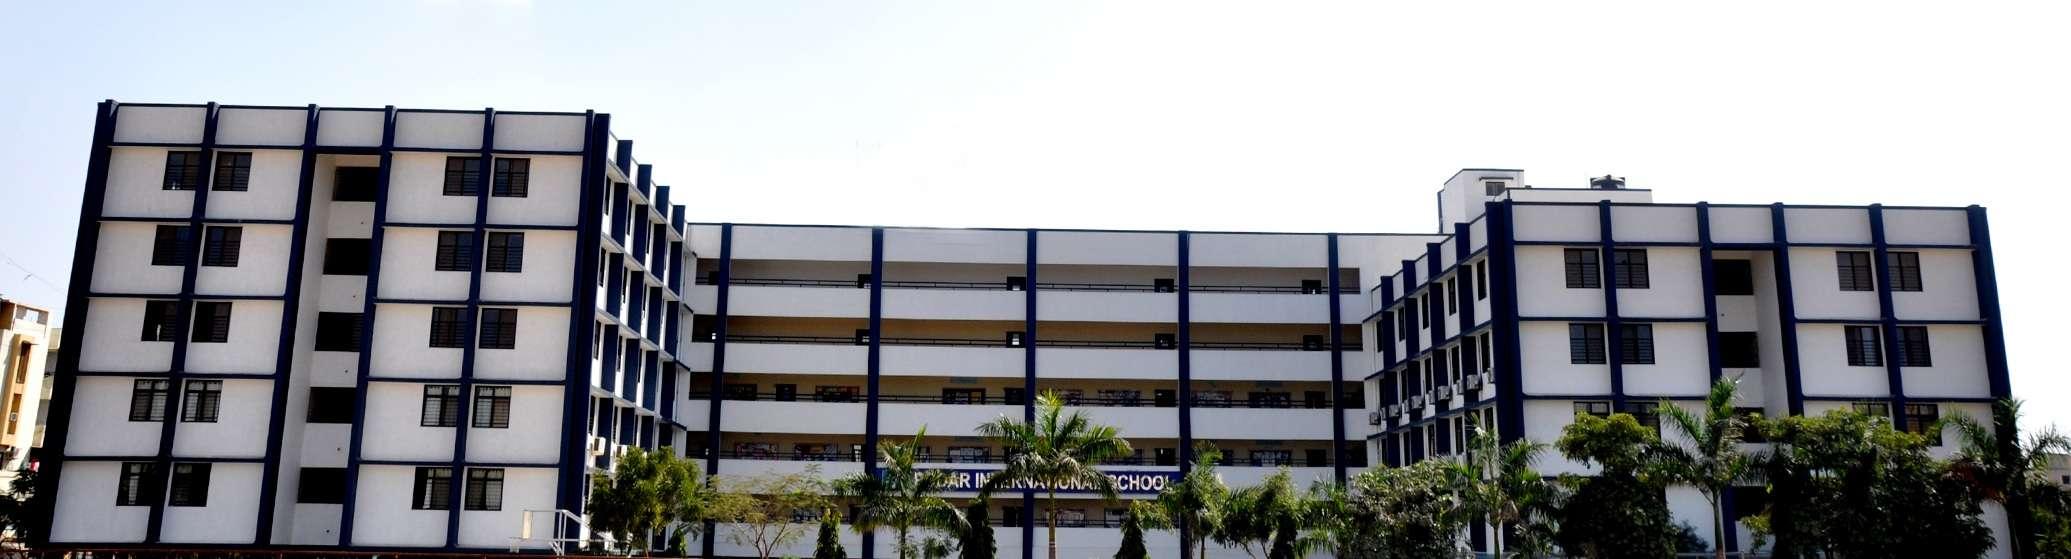 PODAR INTERNATIONAL SCHOOL AHMEDABAD NEAR TRISHALA COMPLEX CROSS ROAD NEW CG ROAD CHANDKHEDA 430163